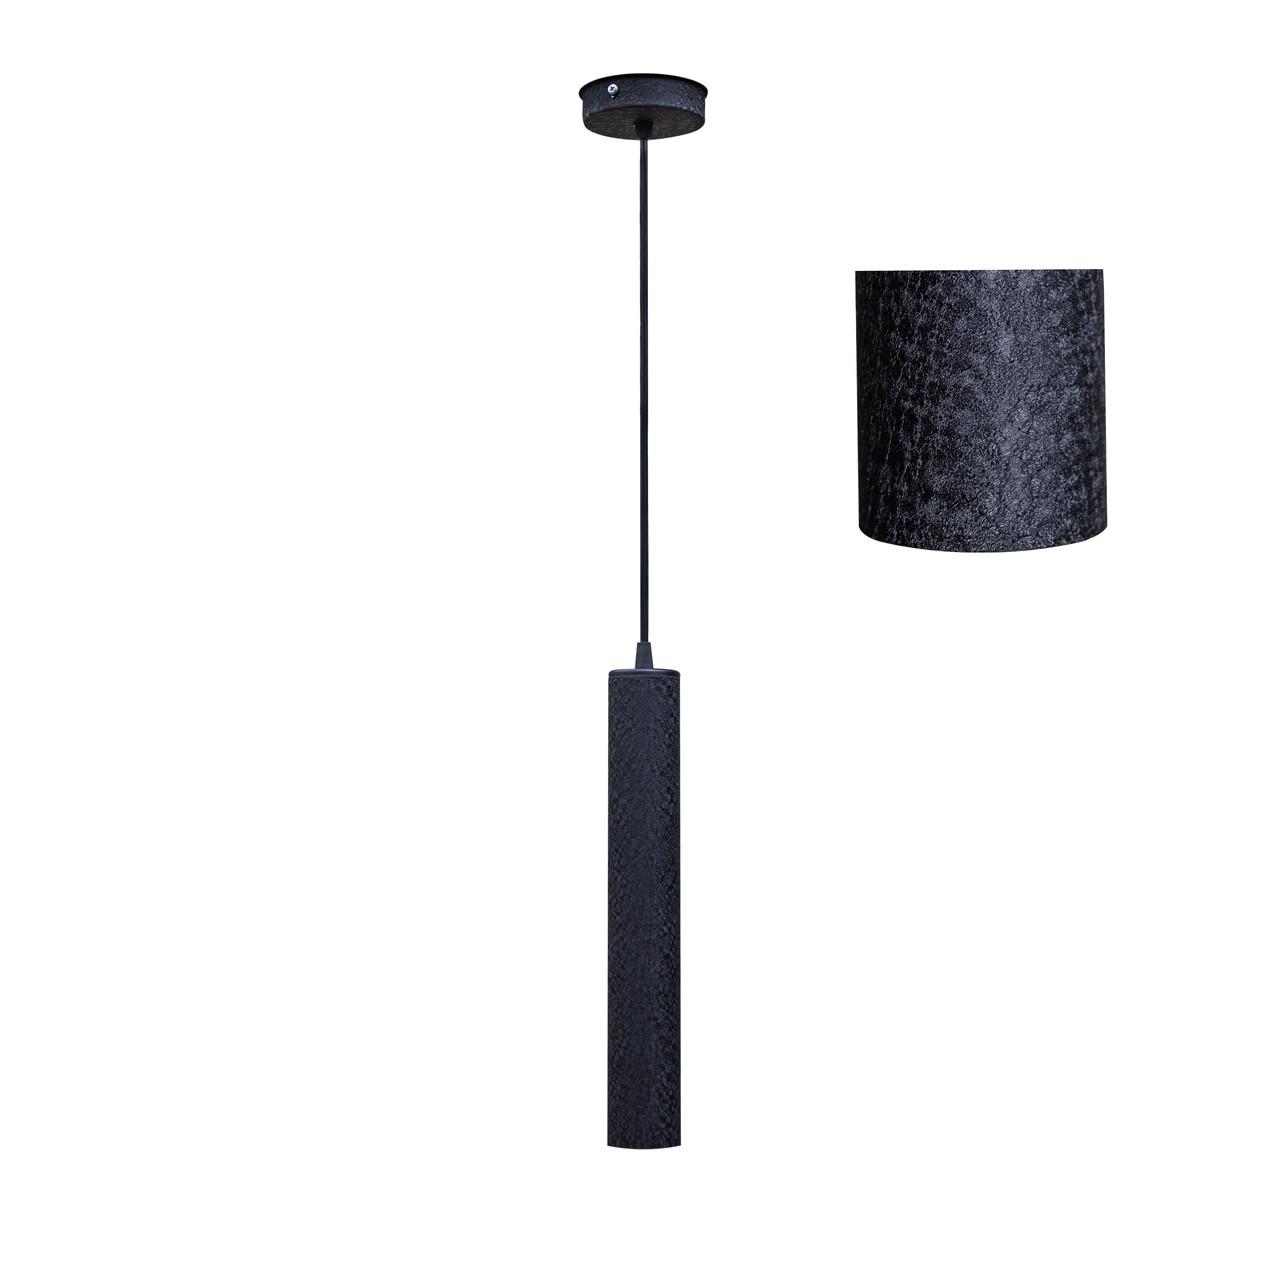 Светильник подвесной MSK Electric Tube MR 3522 BK